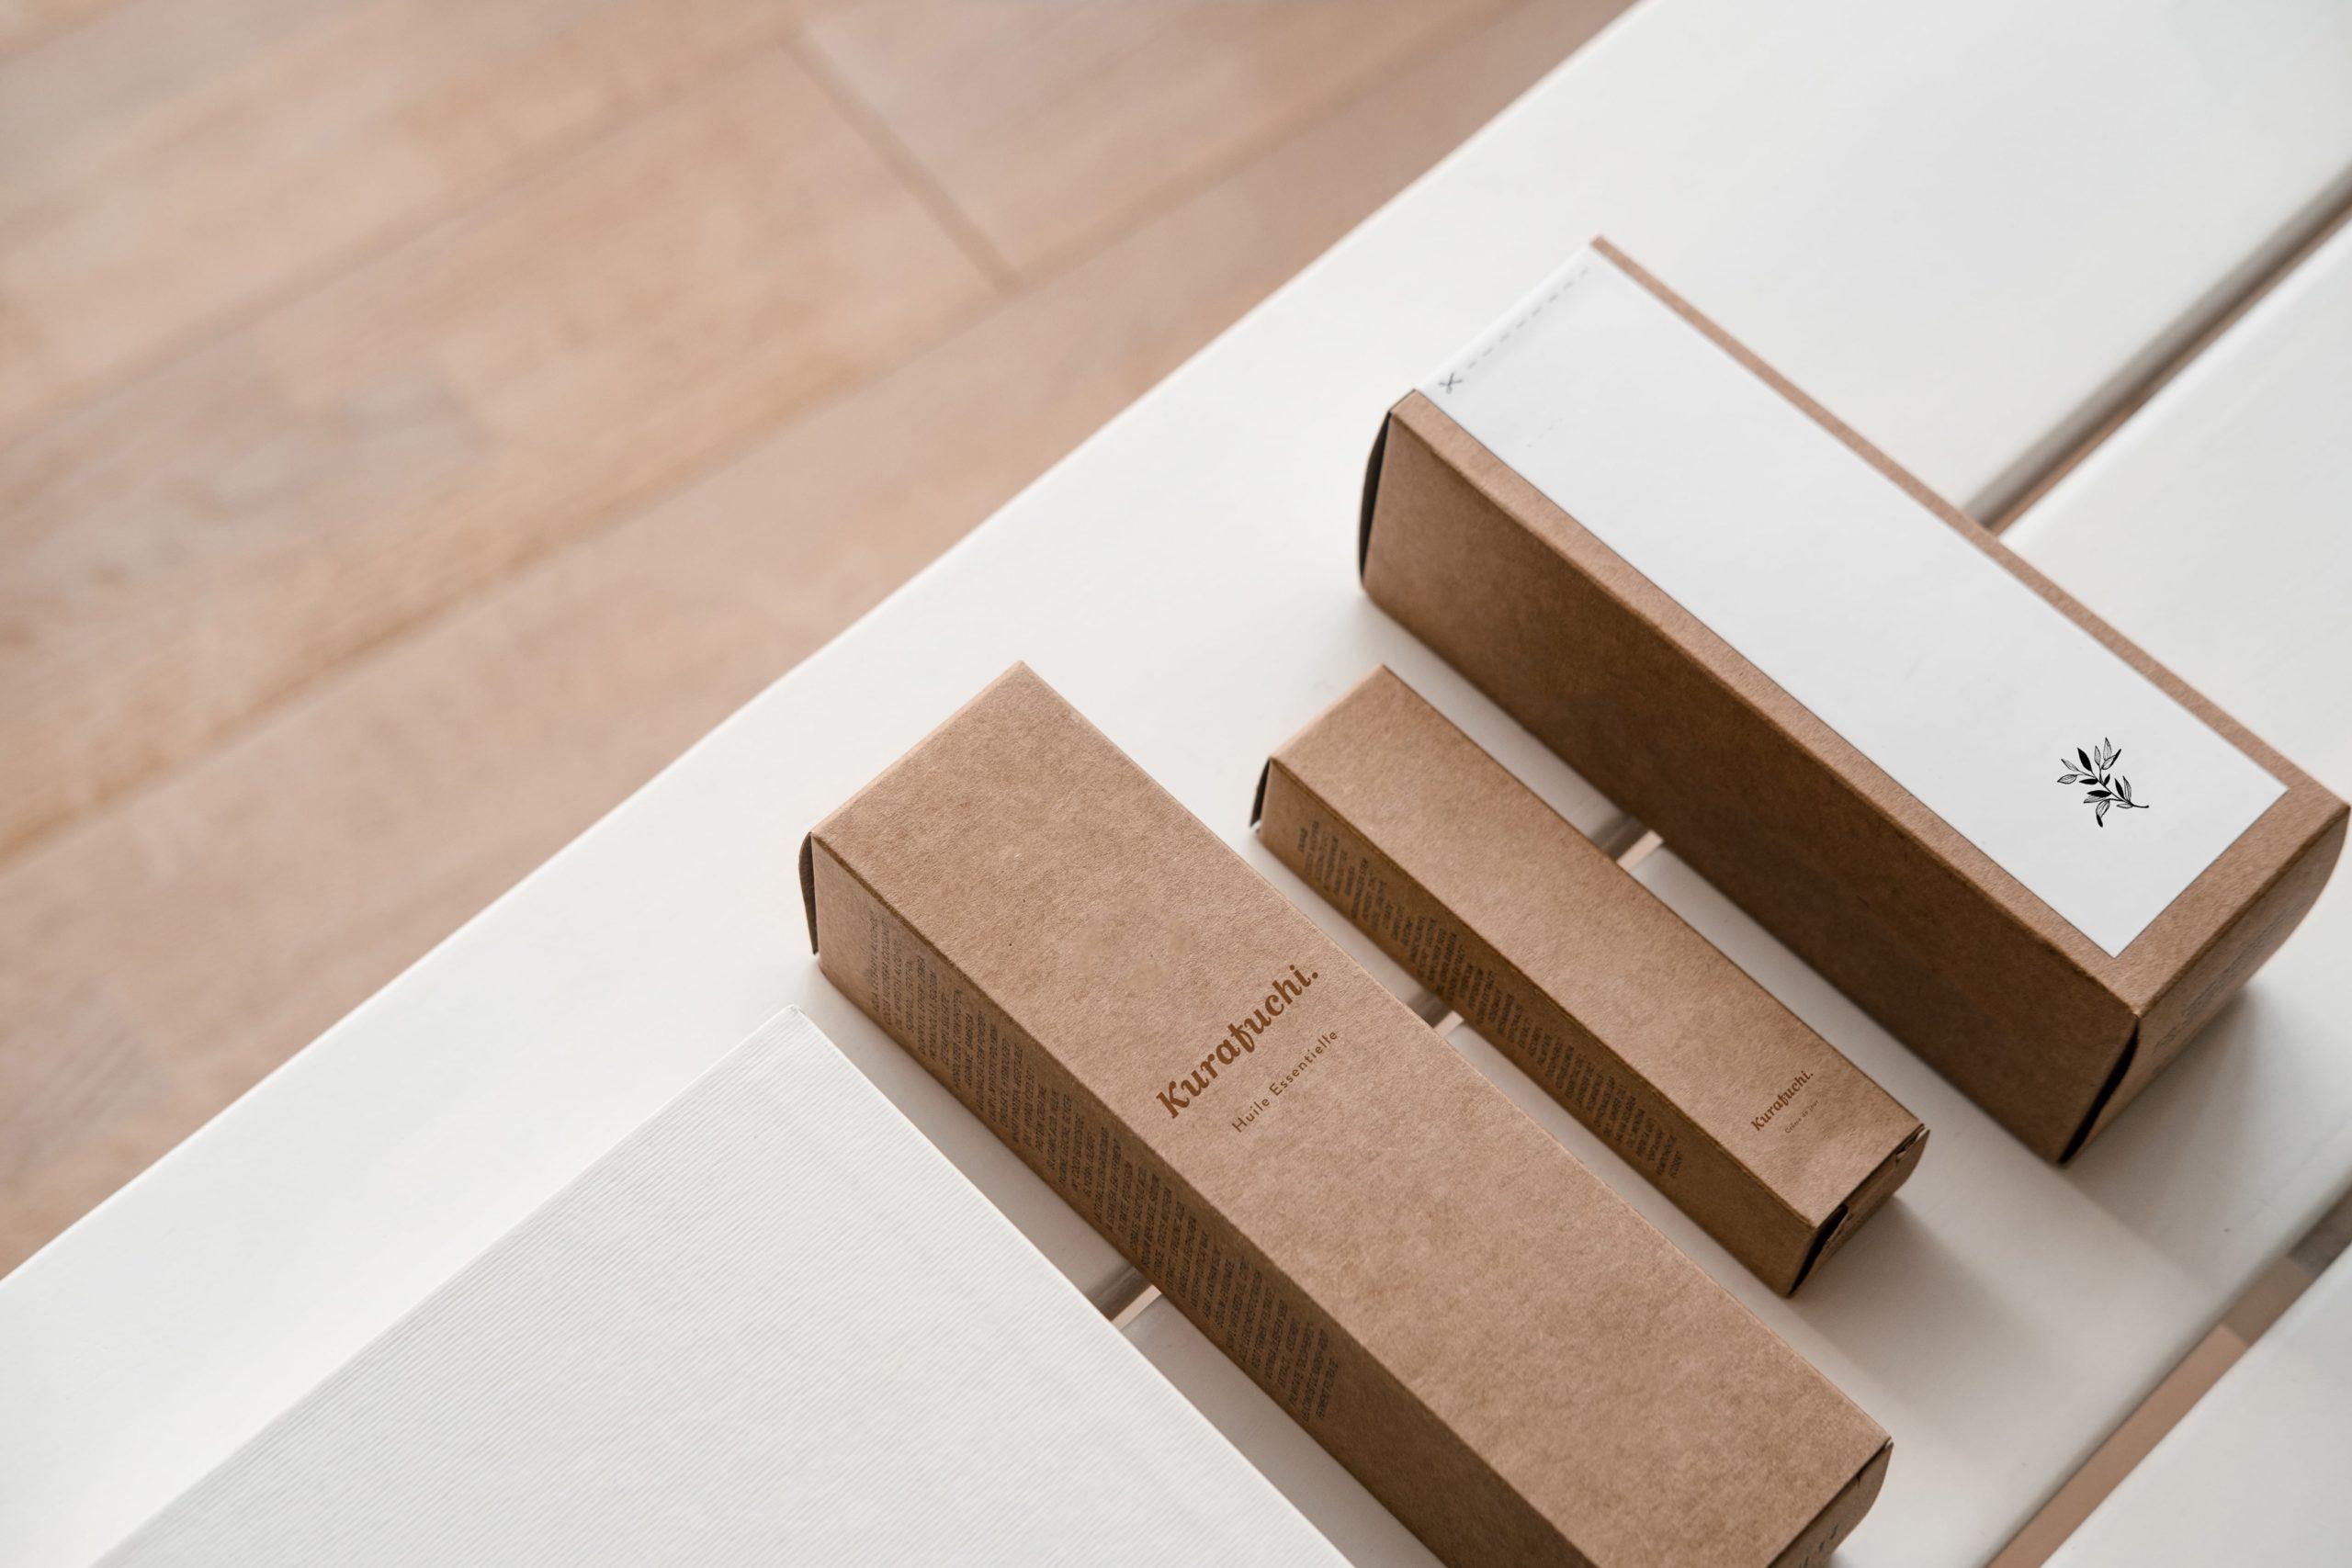 Packaging de la marque Kurafuchi en kraft blanc et marron